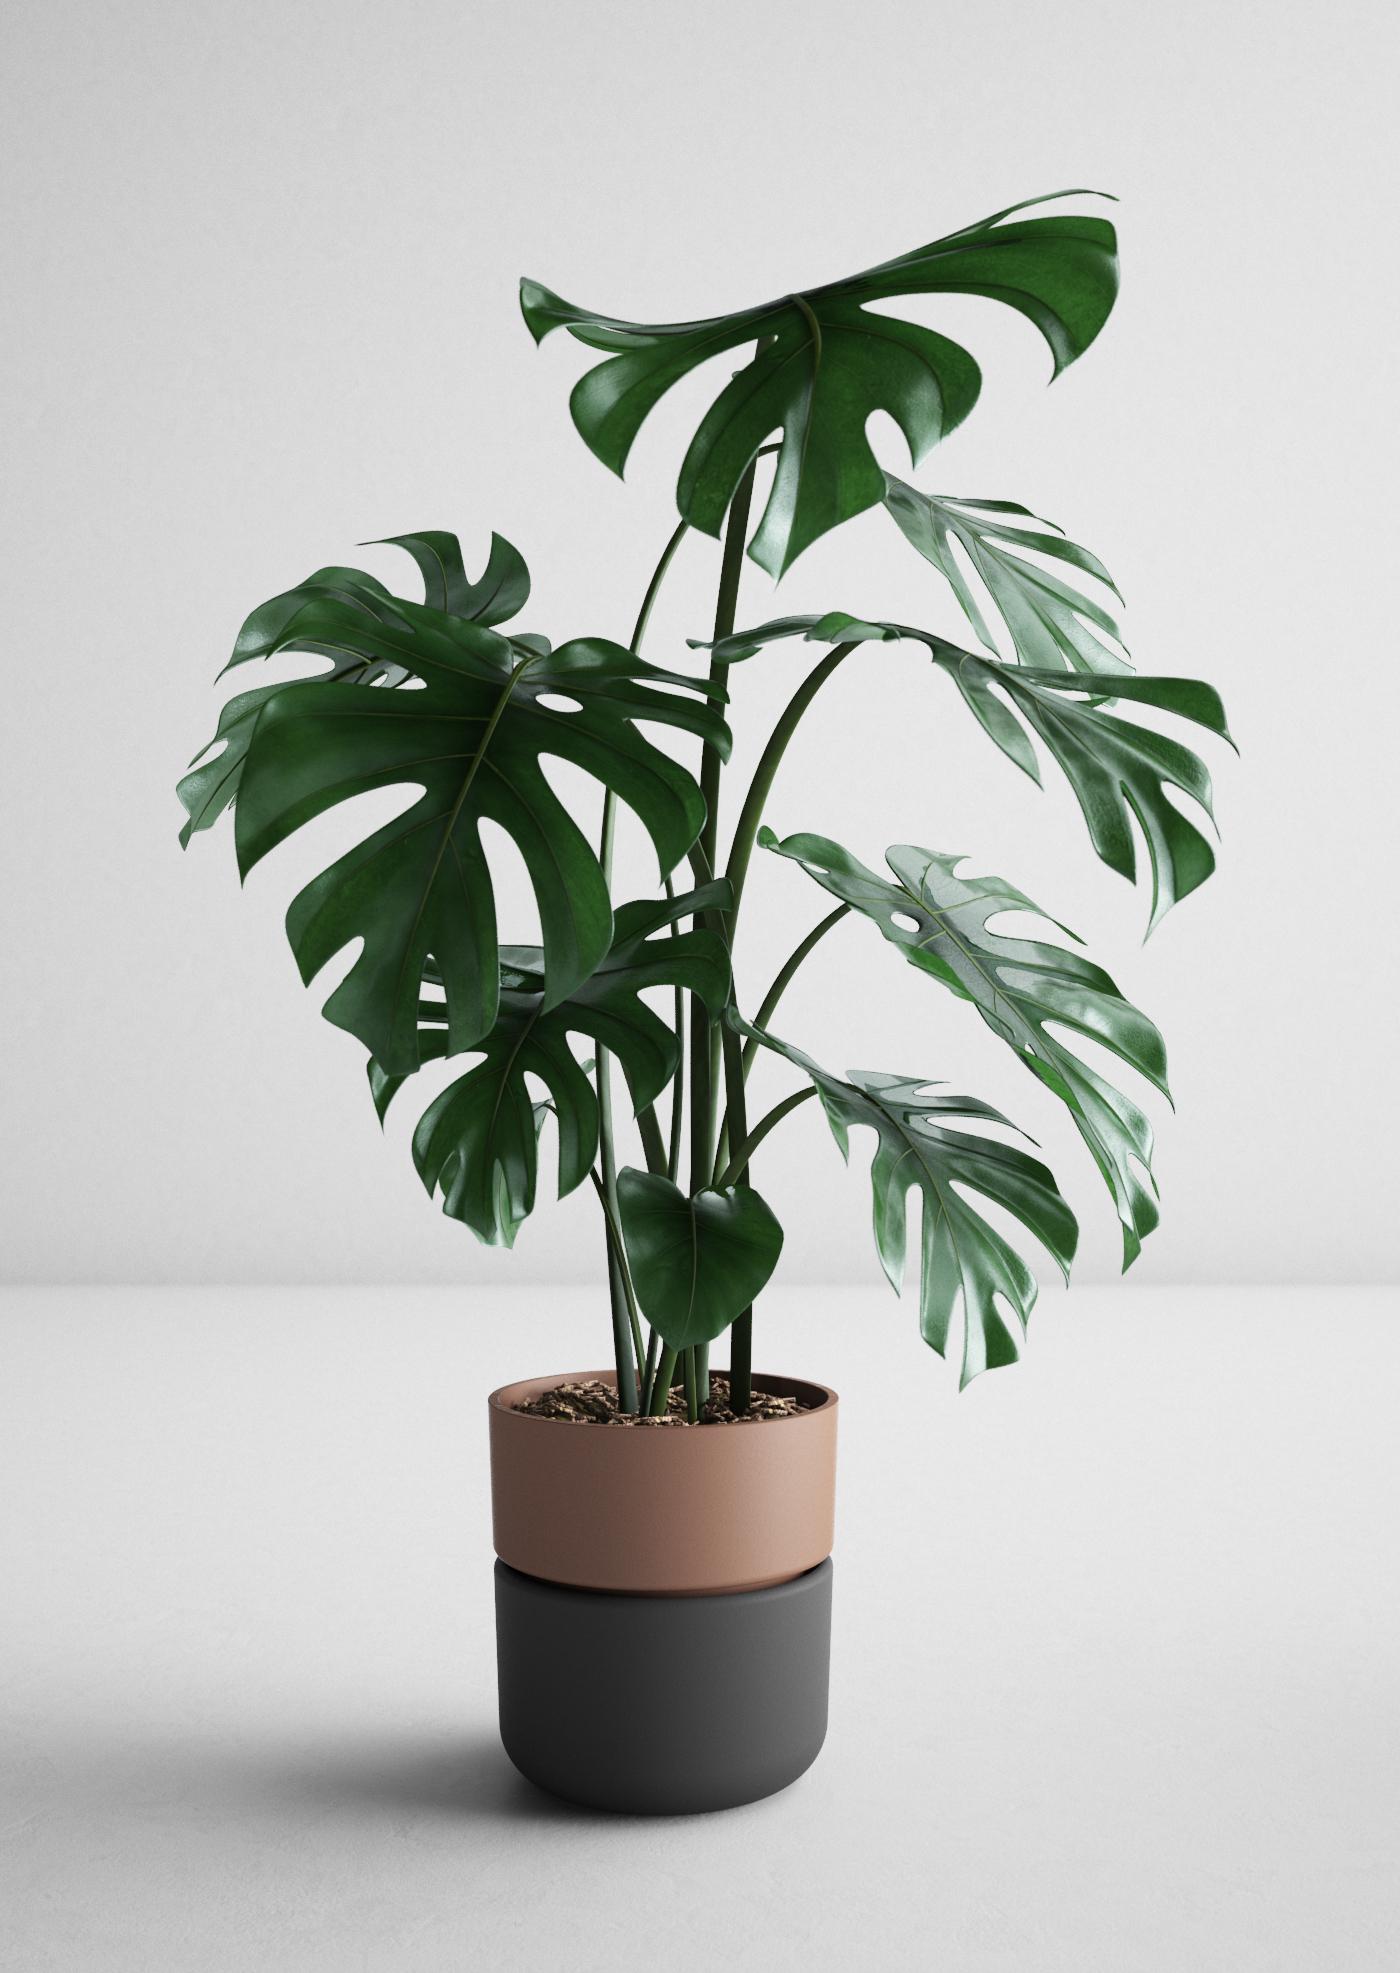 haenke_deFORM_planter I